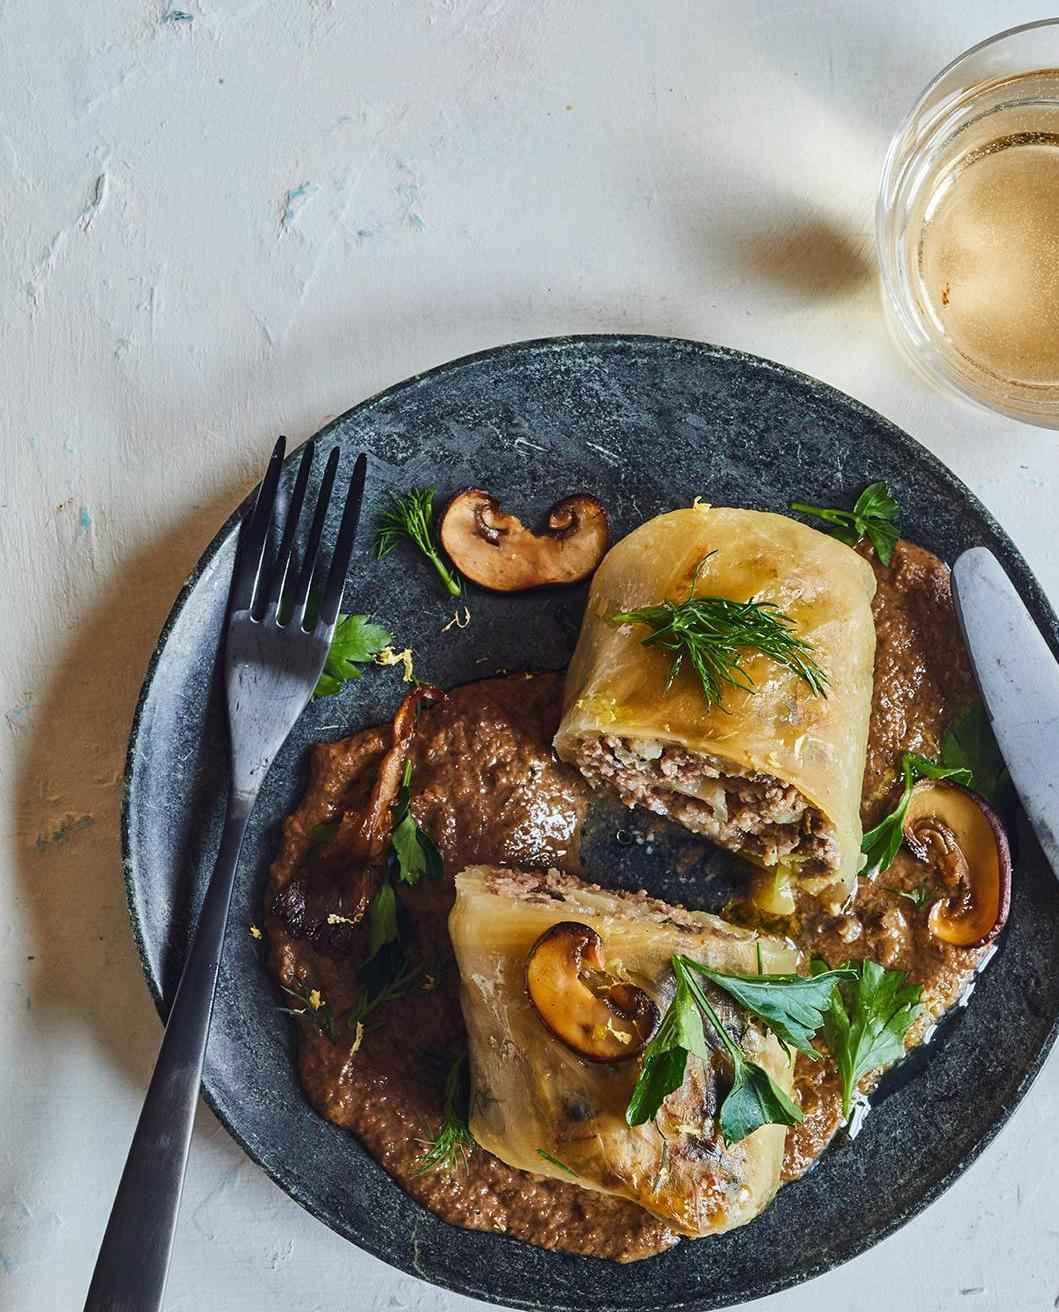 Revisit Bubbe's Kitchen with Jeffrey Yoskowitz image